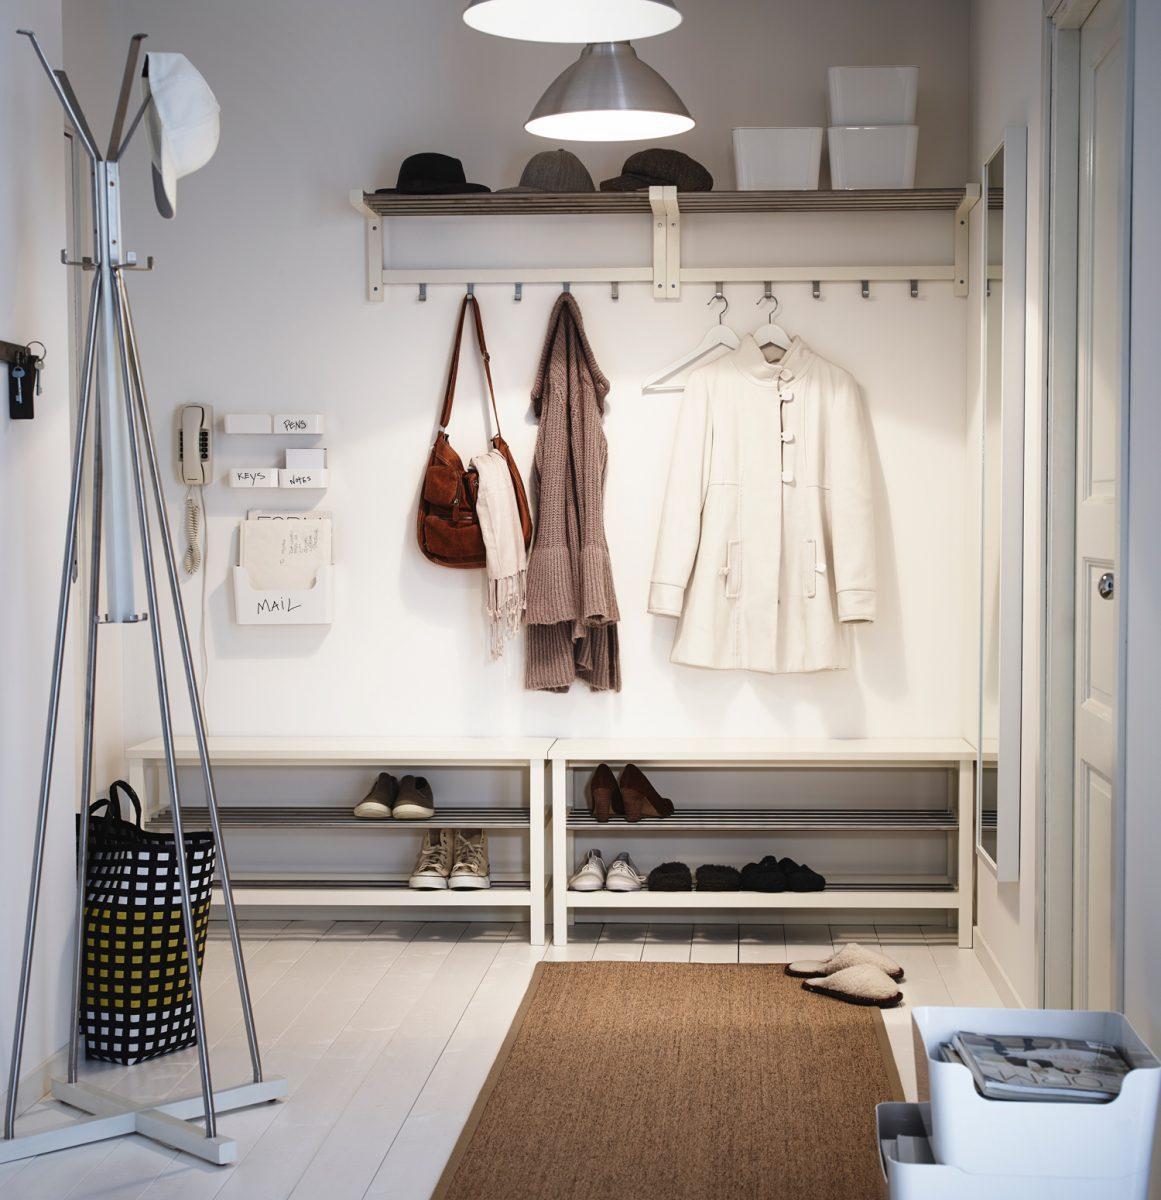 1000 Images About Ikea Showroom Inspiration On Pinterest: Scarpiera IKEA